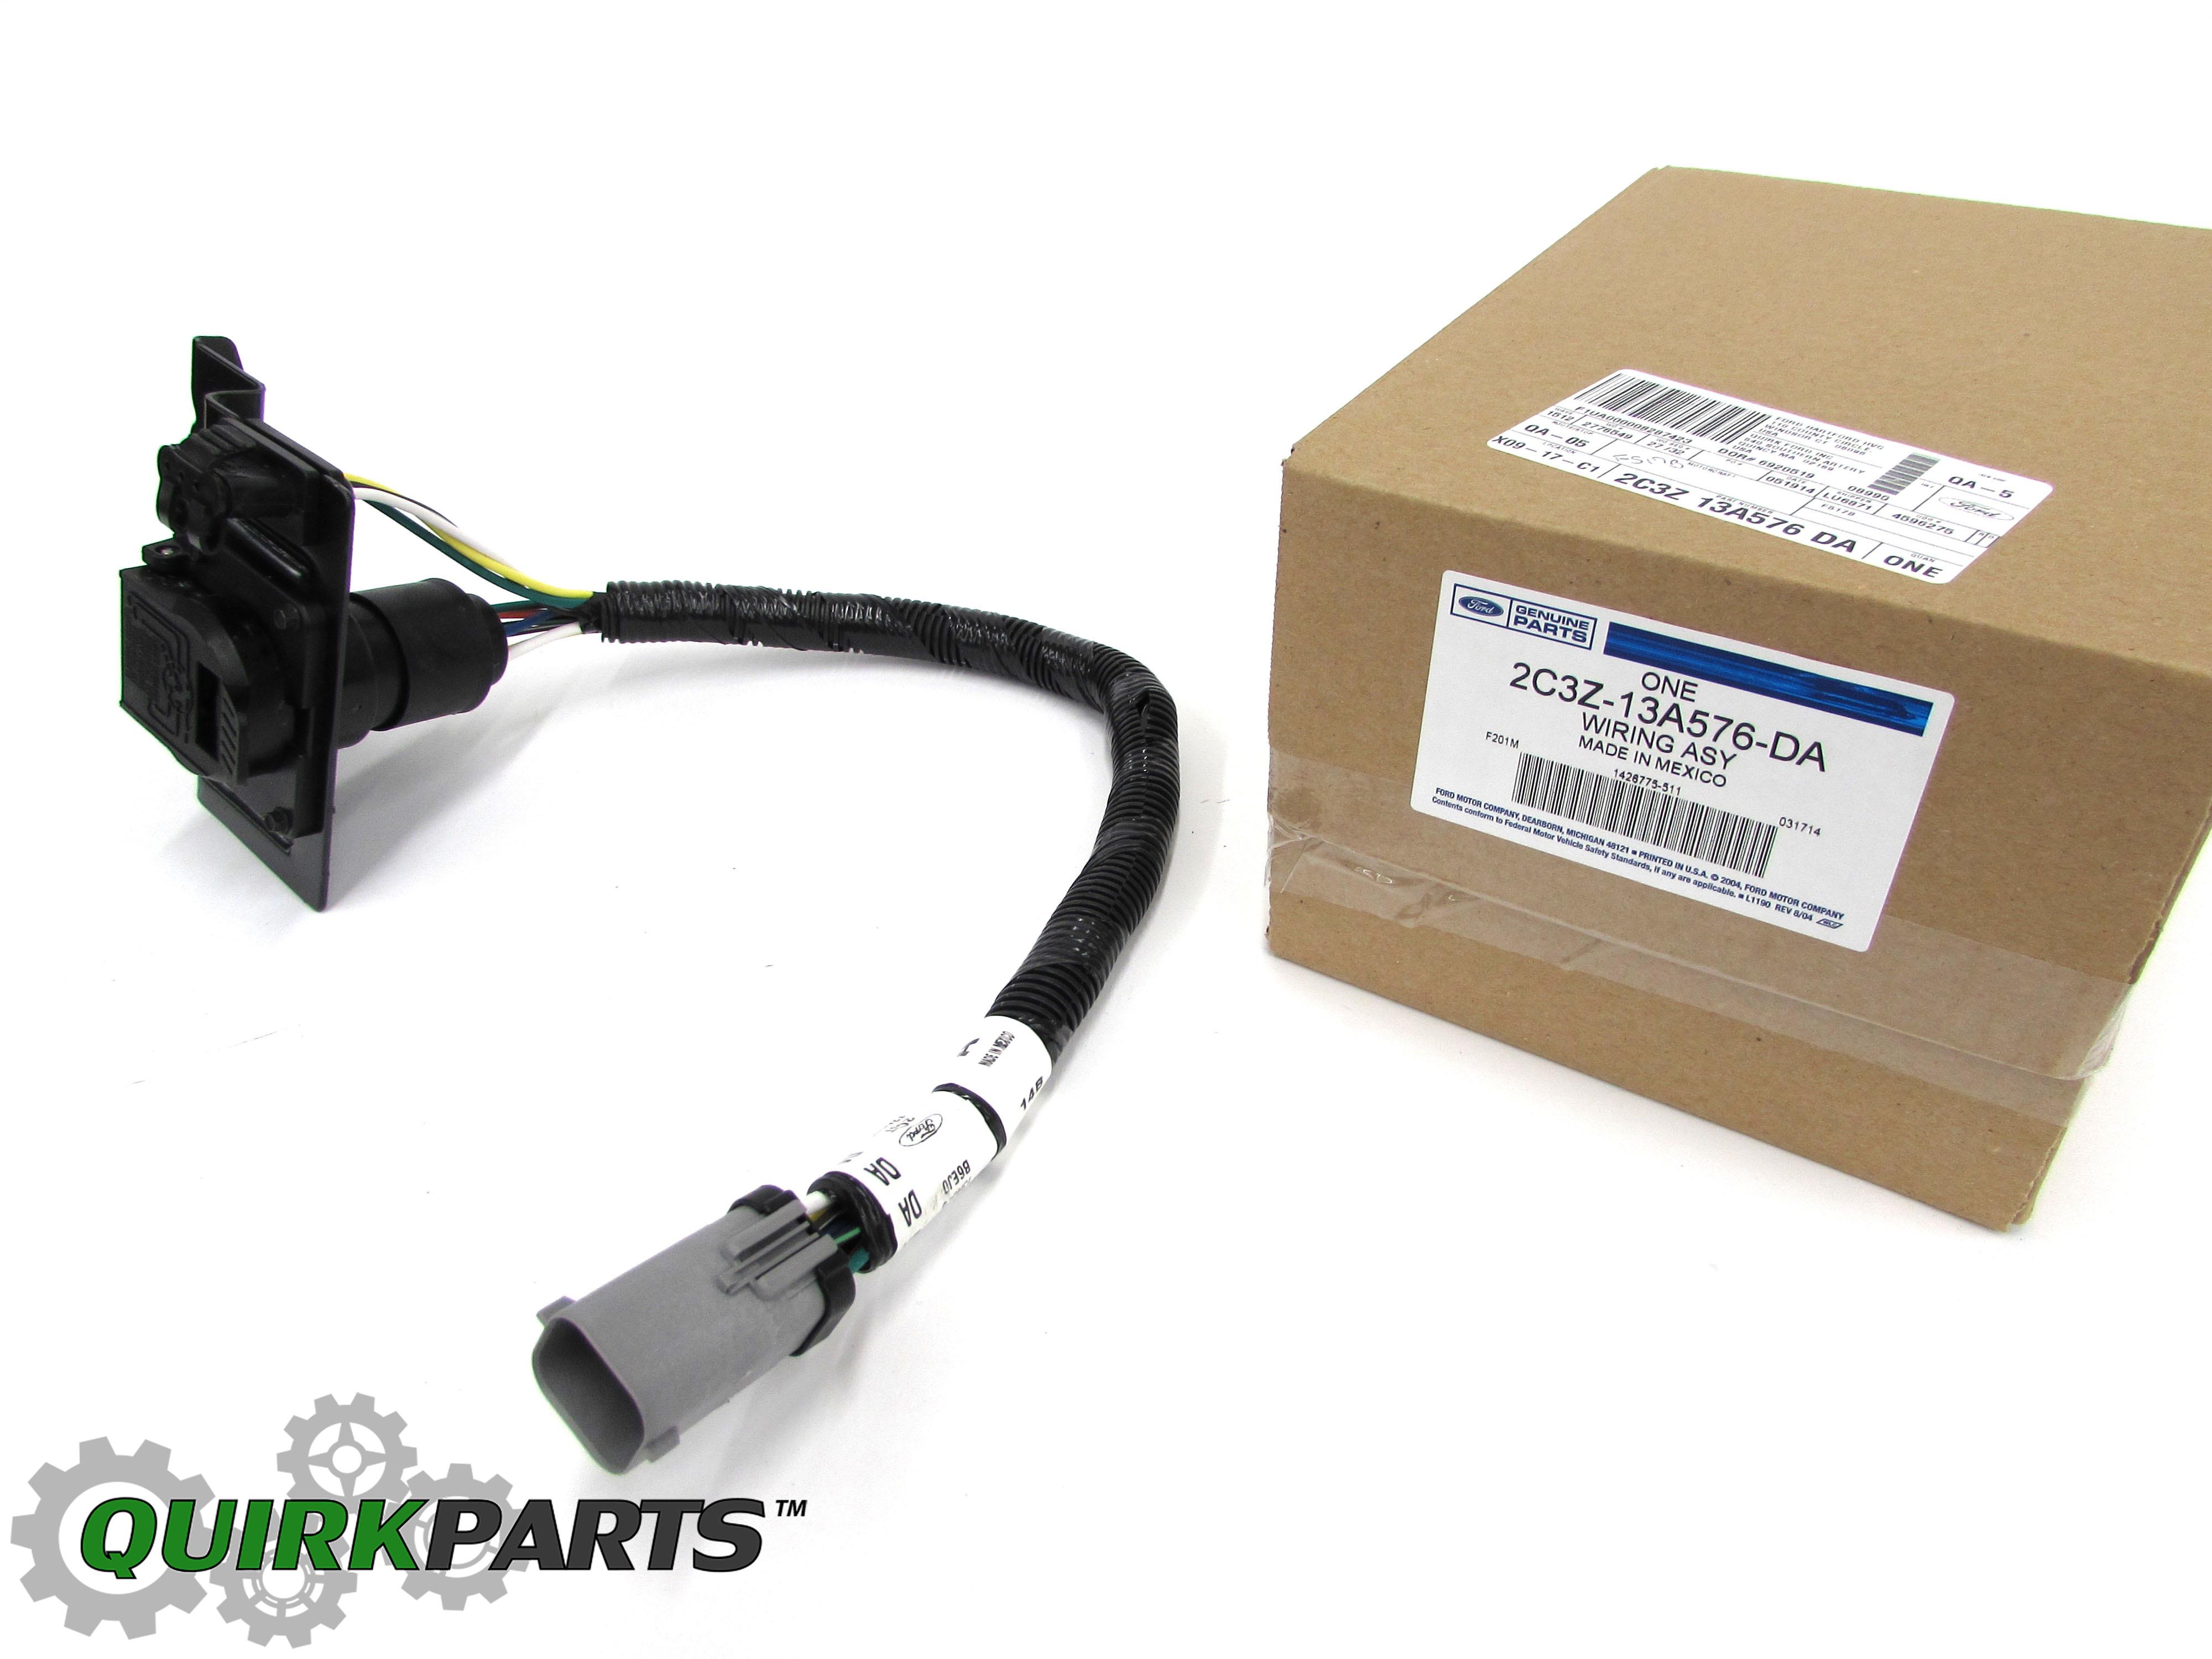 2001 ford f250 trailer plug wiring diagram yamaha banshee headlight 2002 2004 f350 super duty 4 and 7 pin tow